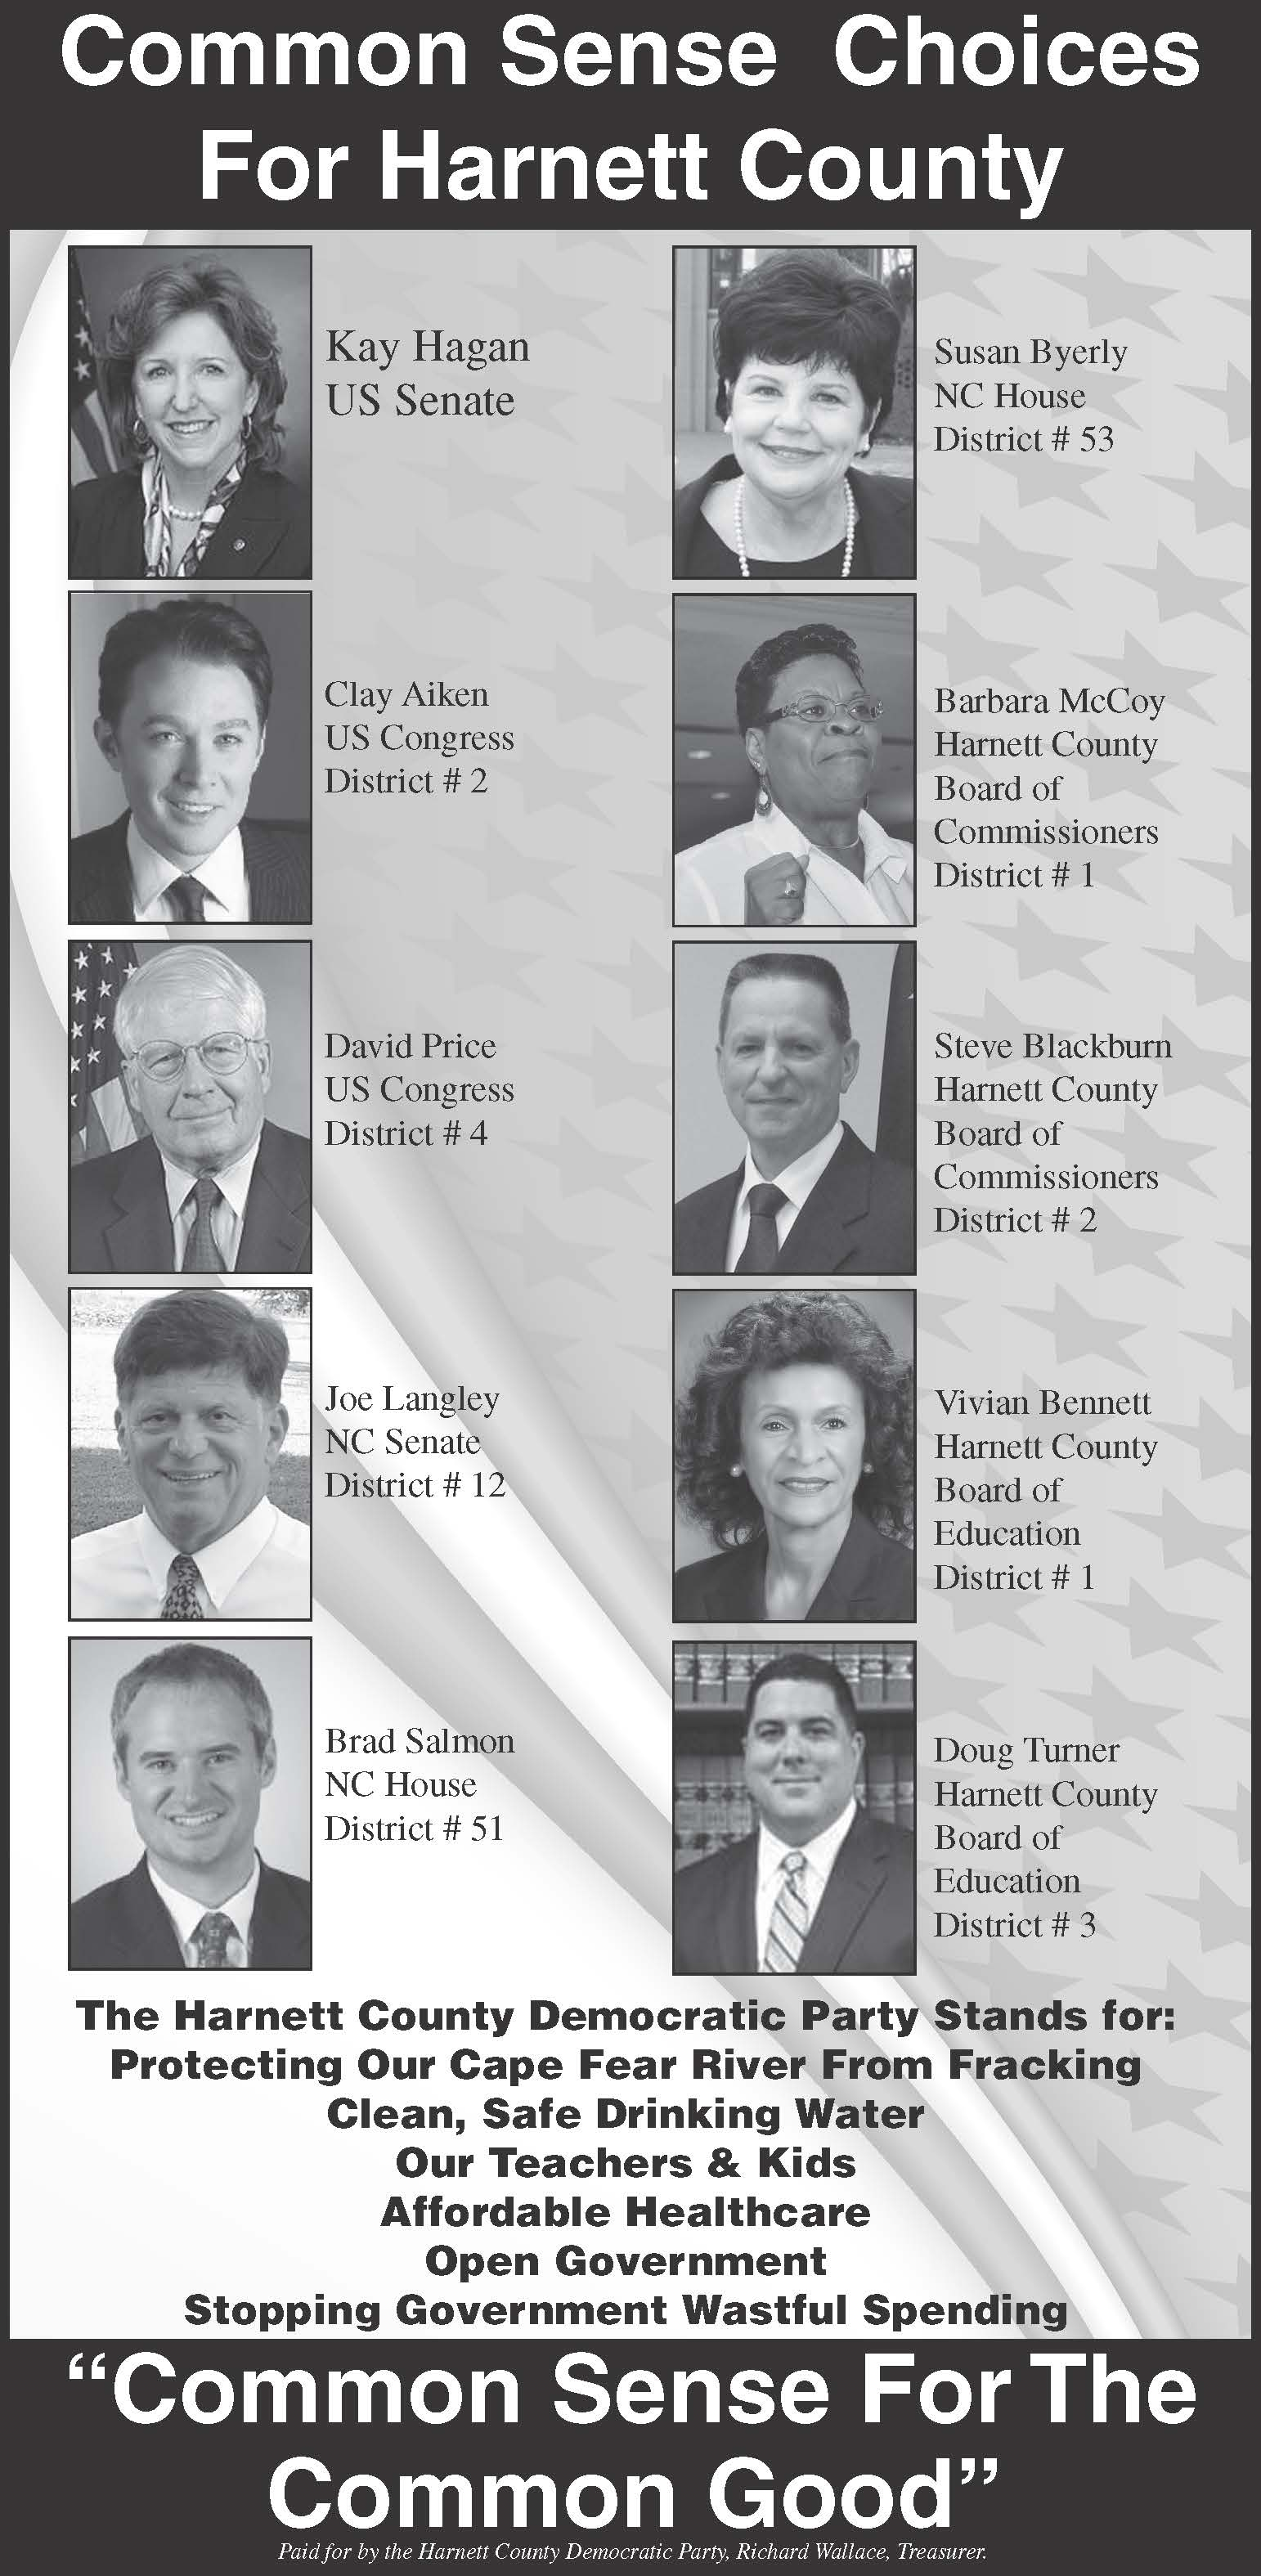 Harnett Co Democrats